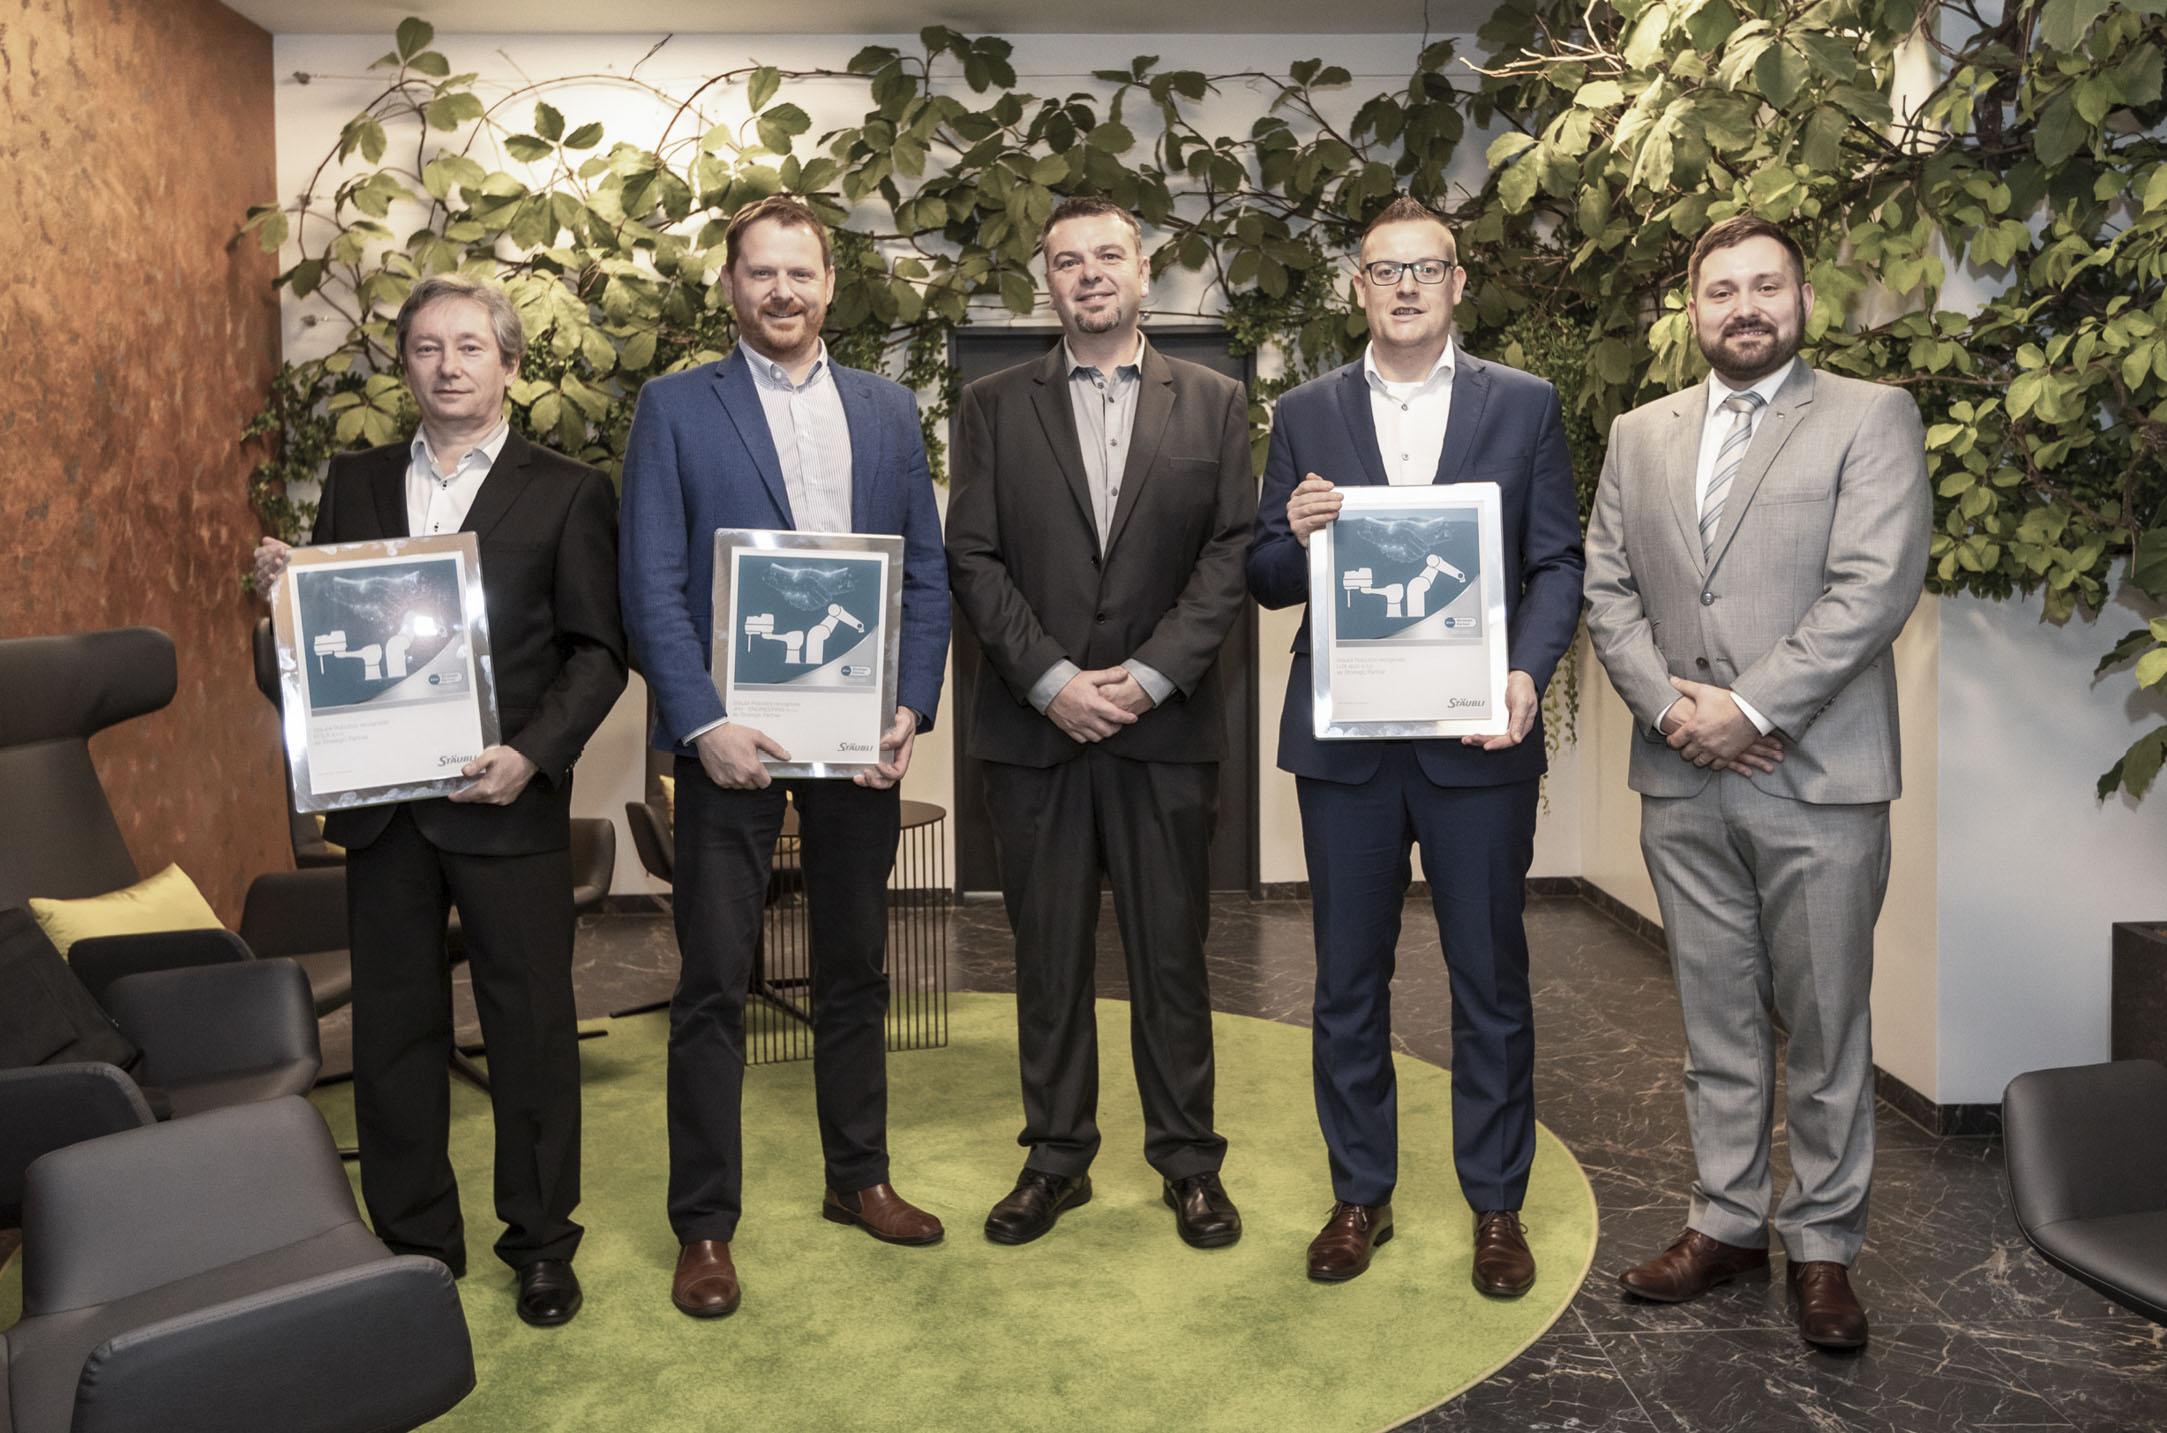 Stäubli AG - Roboty2021-partners-nim@2x.jpg.jpg